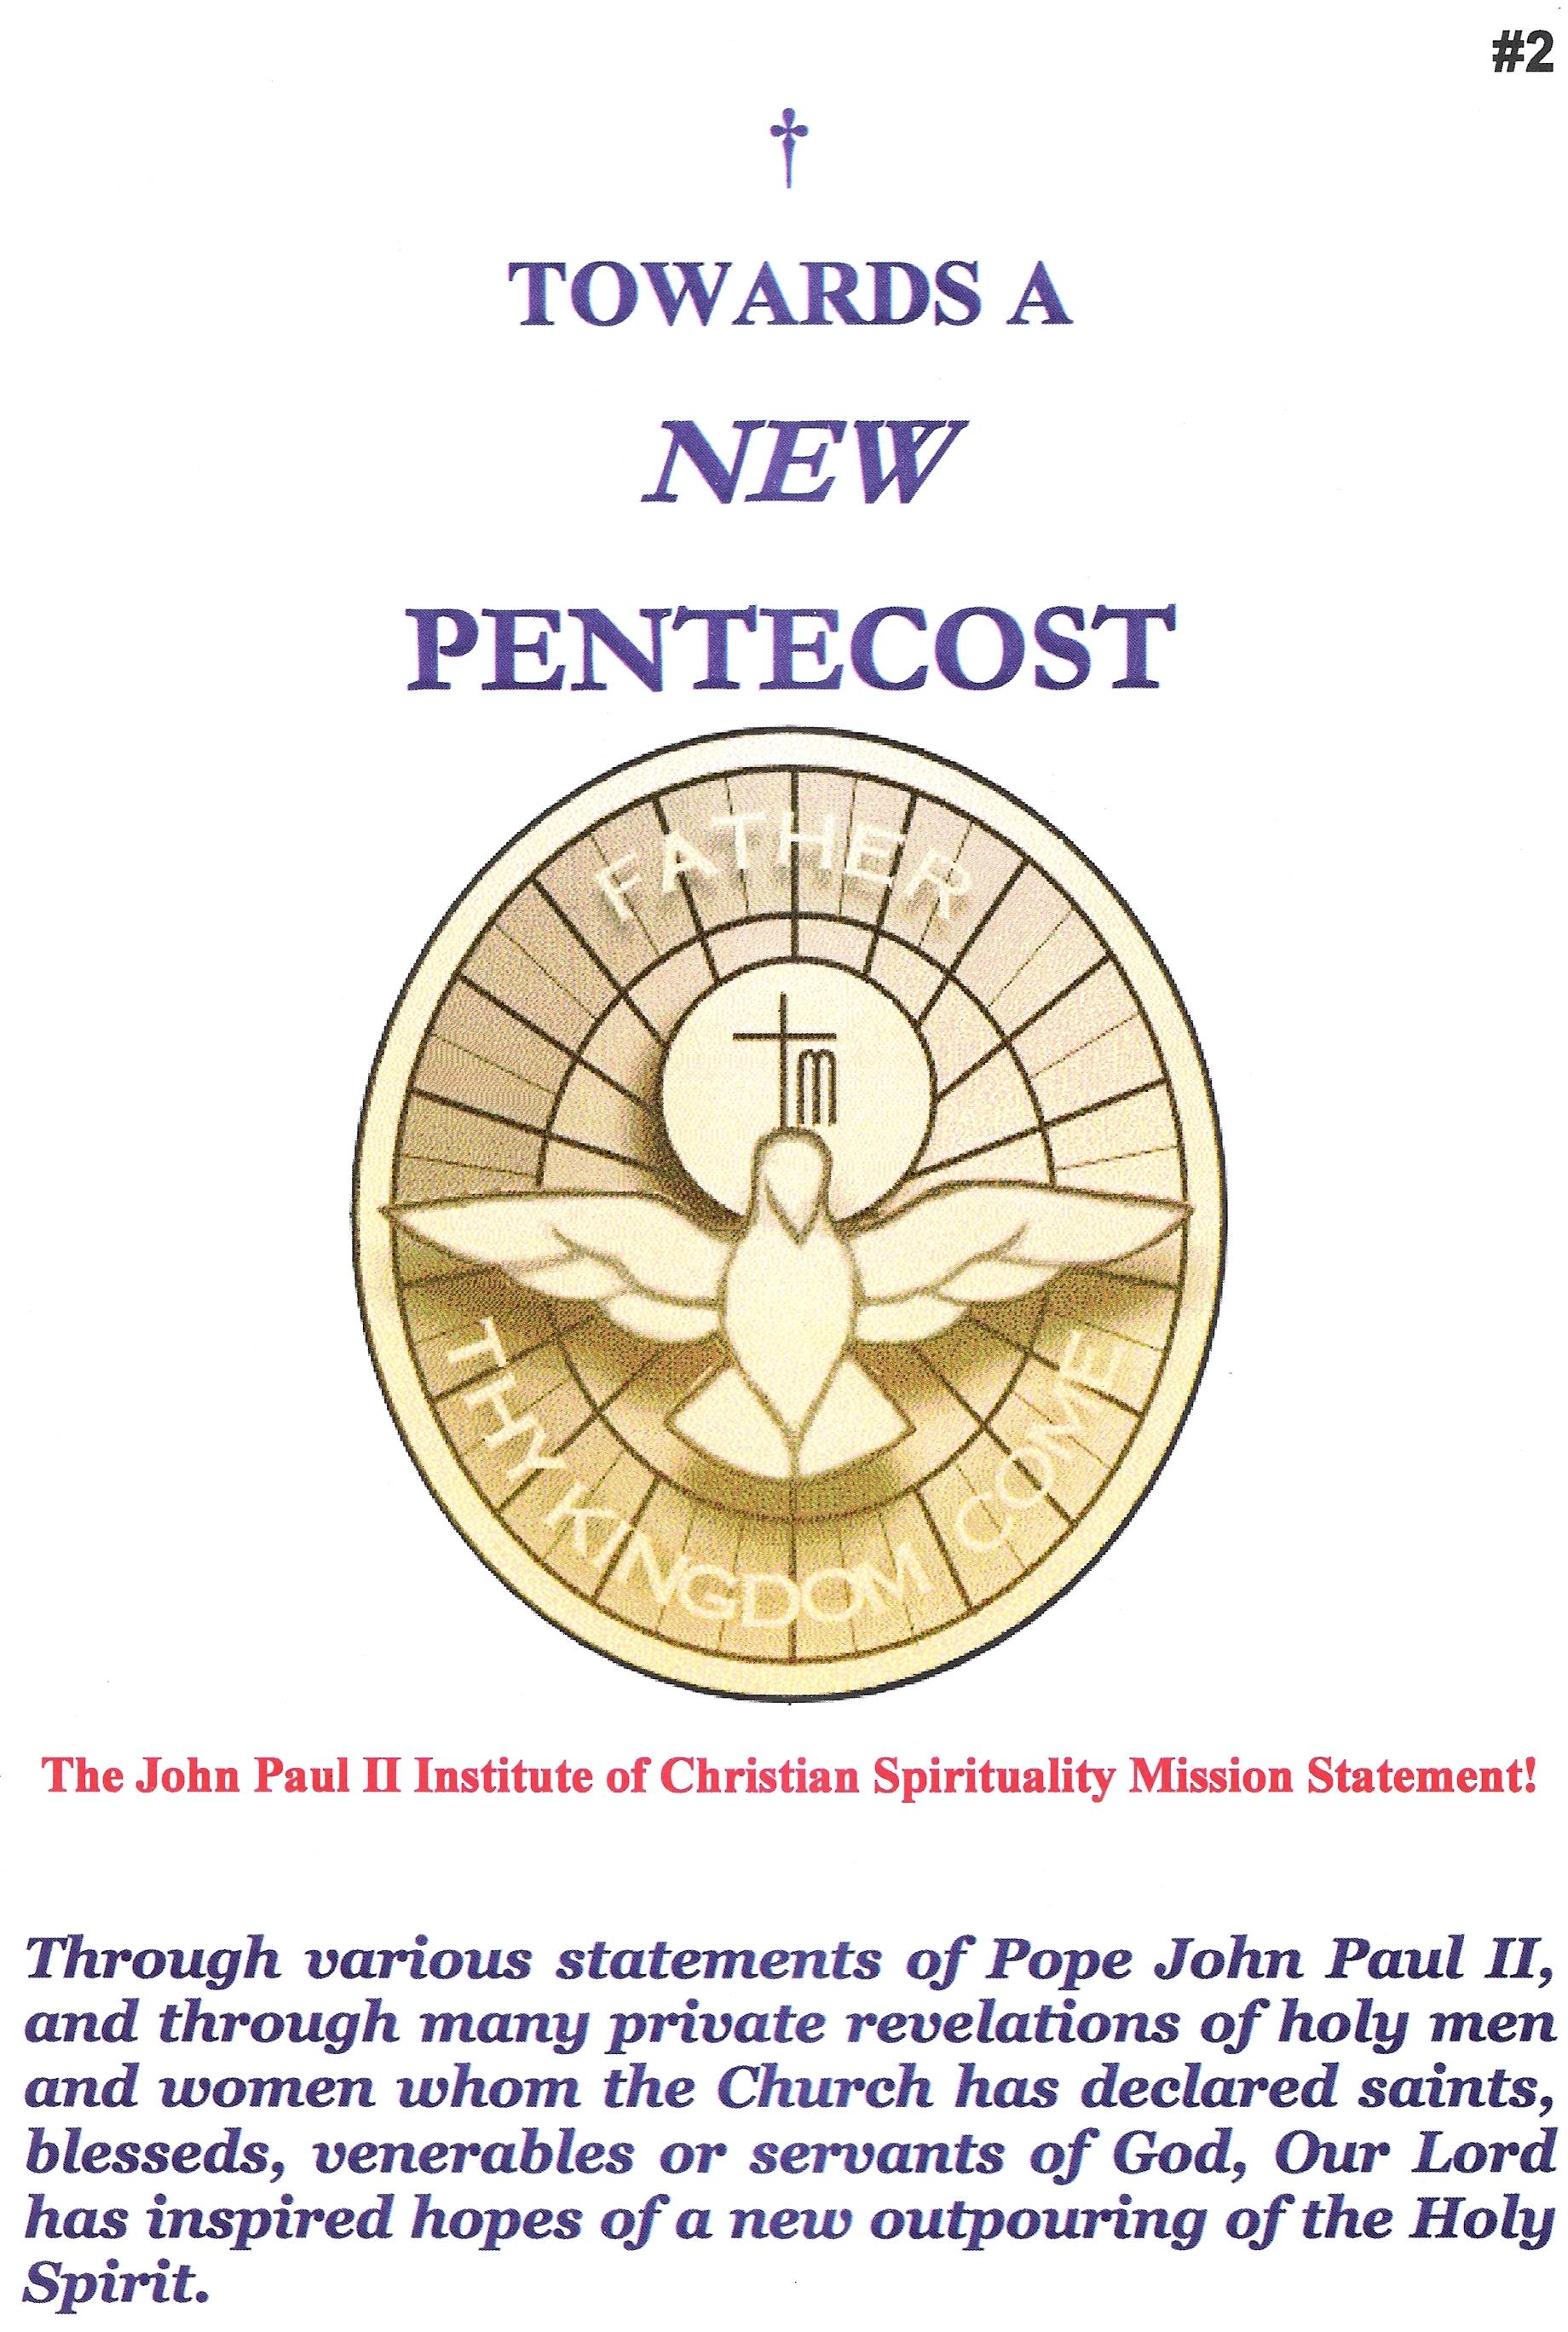 Towards a New Pentecost